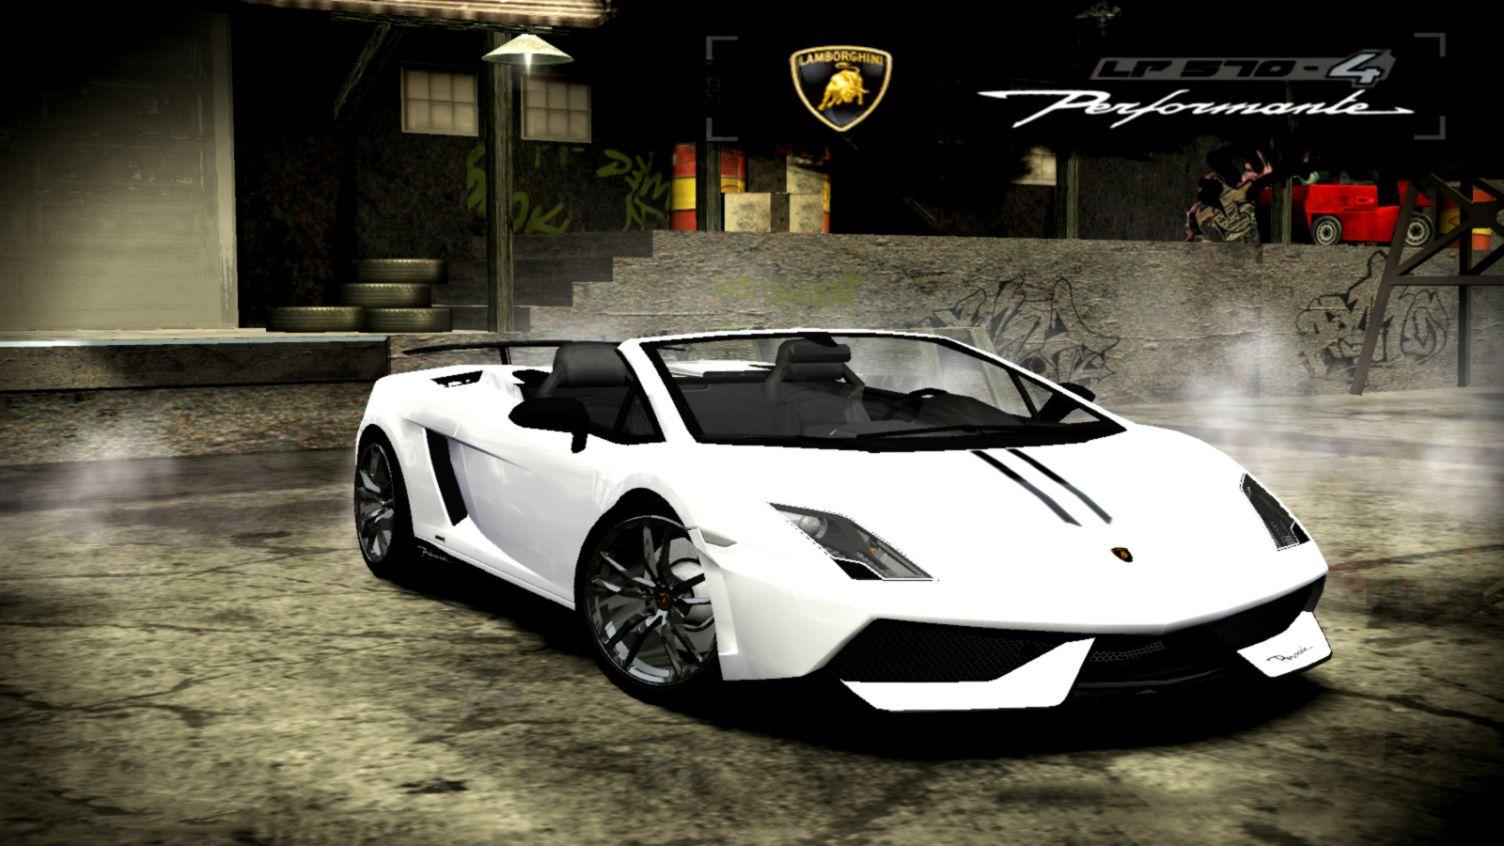 Lamborghini Gallardo Spyder Performante Nfs Most Wanted Cars